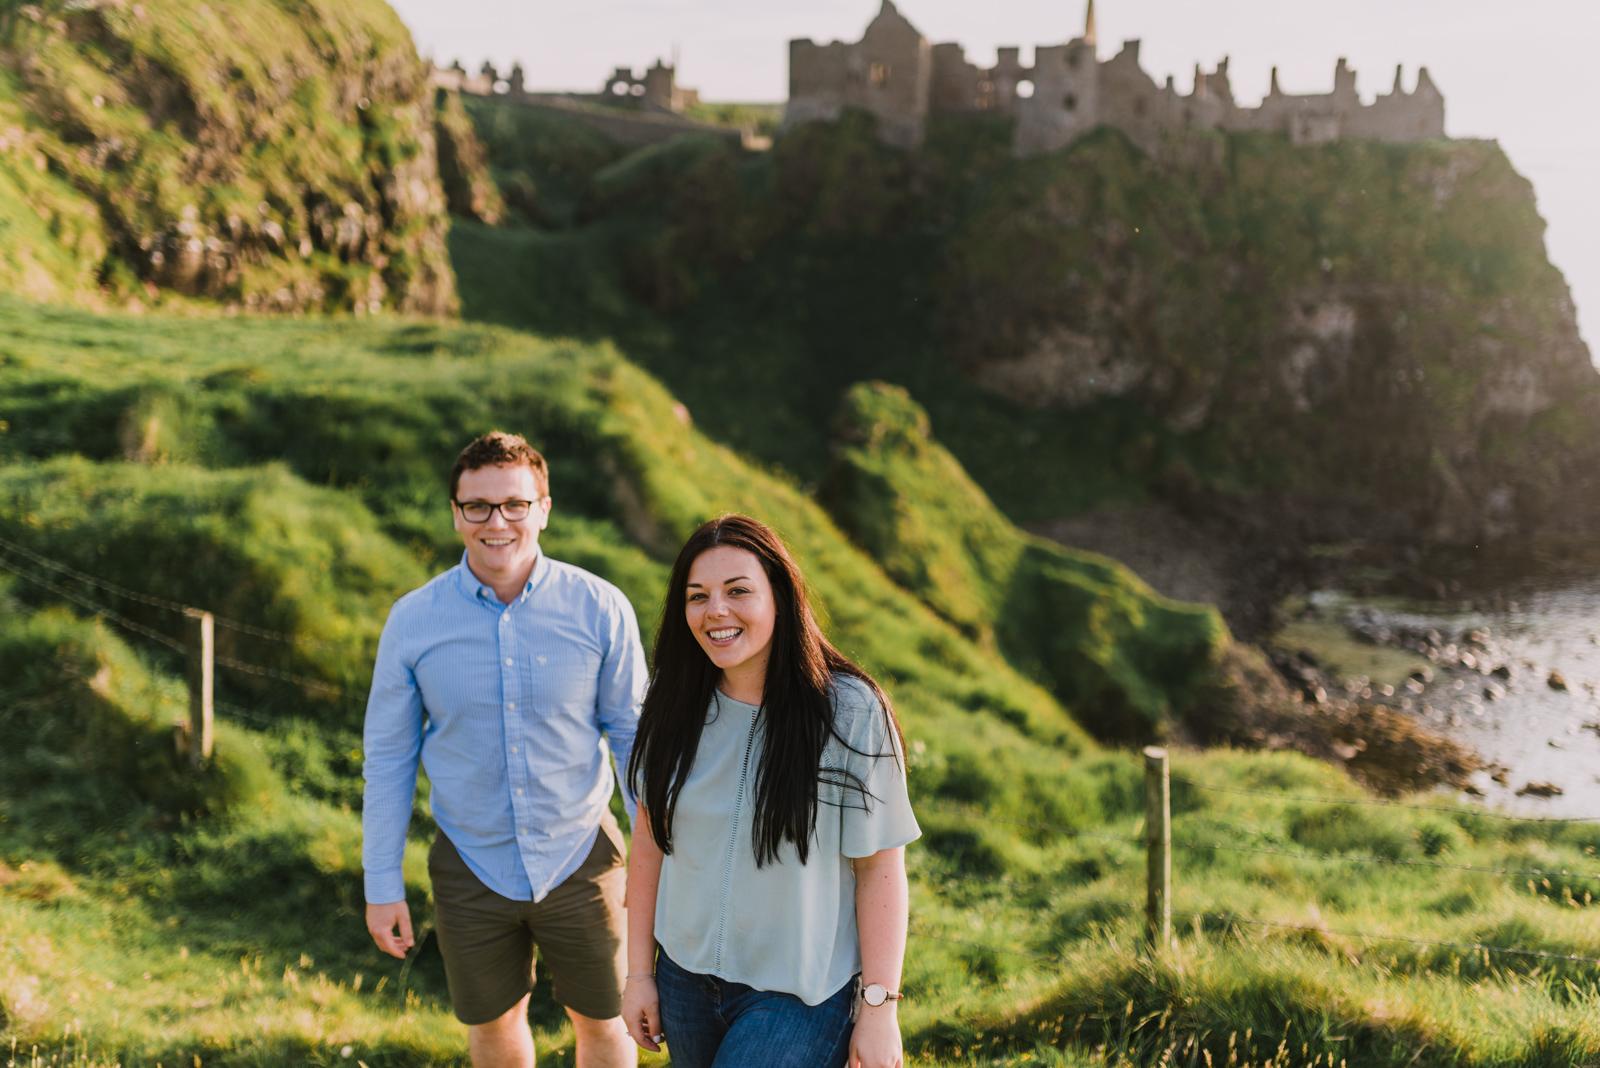 sunset engagement photos by Hello, Sugar taken at Dunluce Castle, Northern Ireland-15.jpg